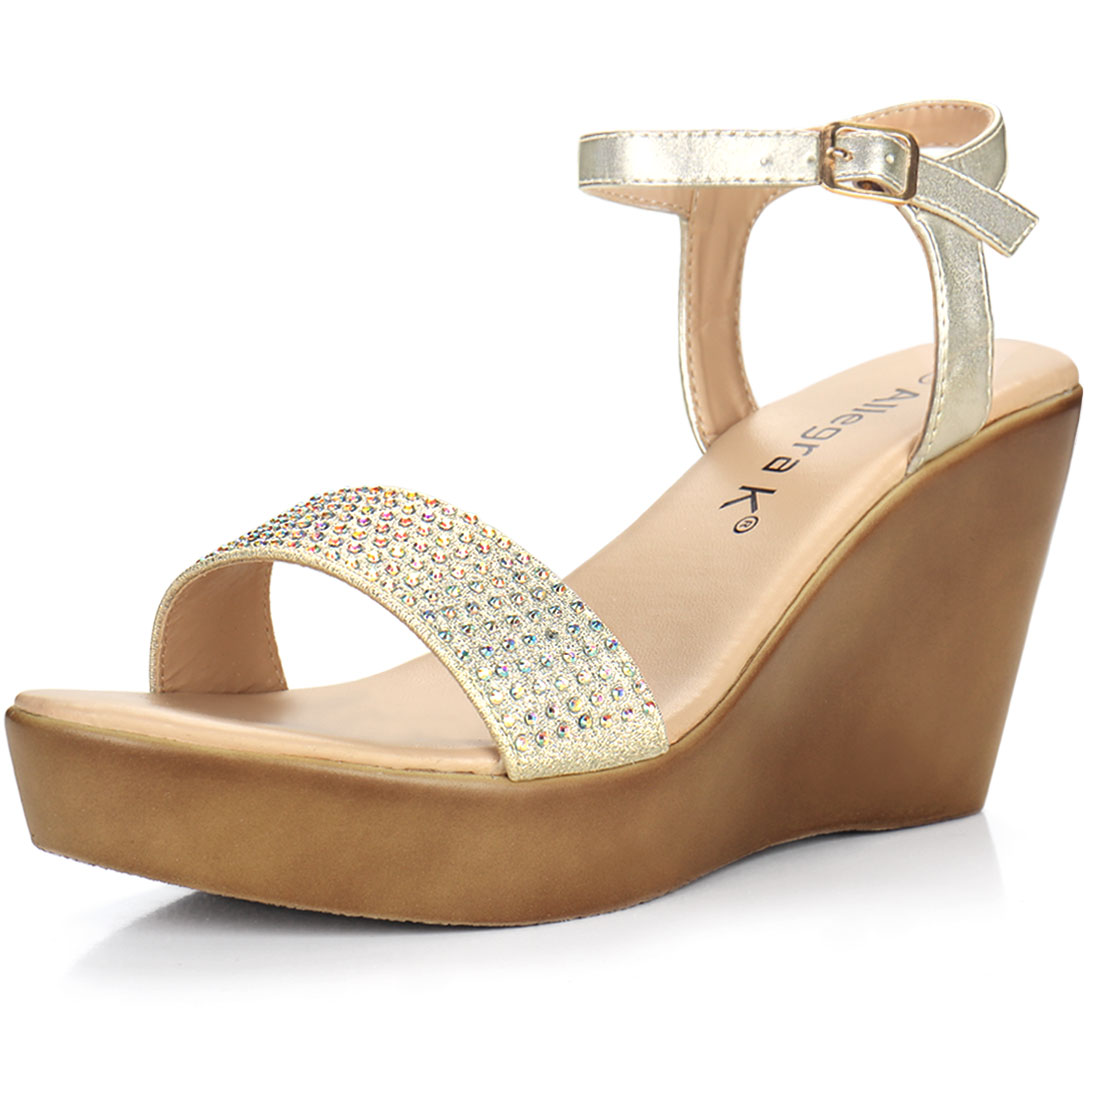 Woman Rhinestones Embellished Open Toe Wedge Sandals Gold US 9